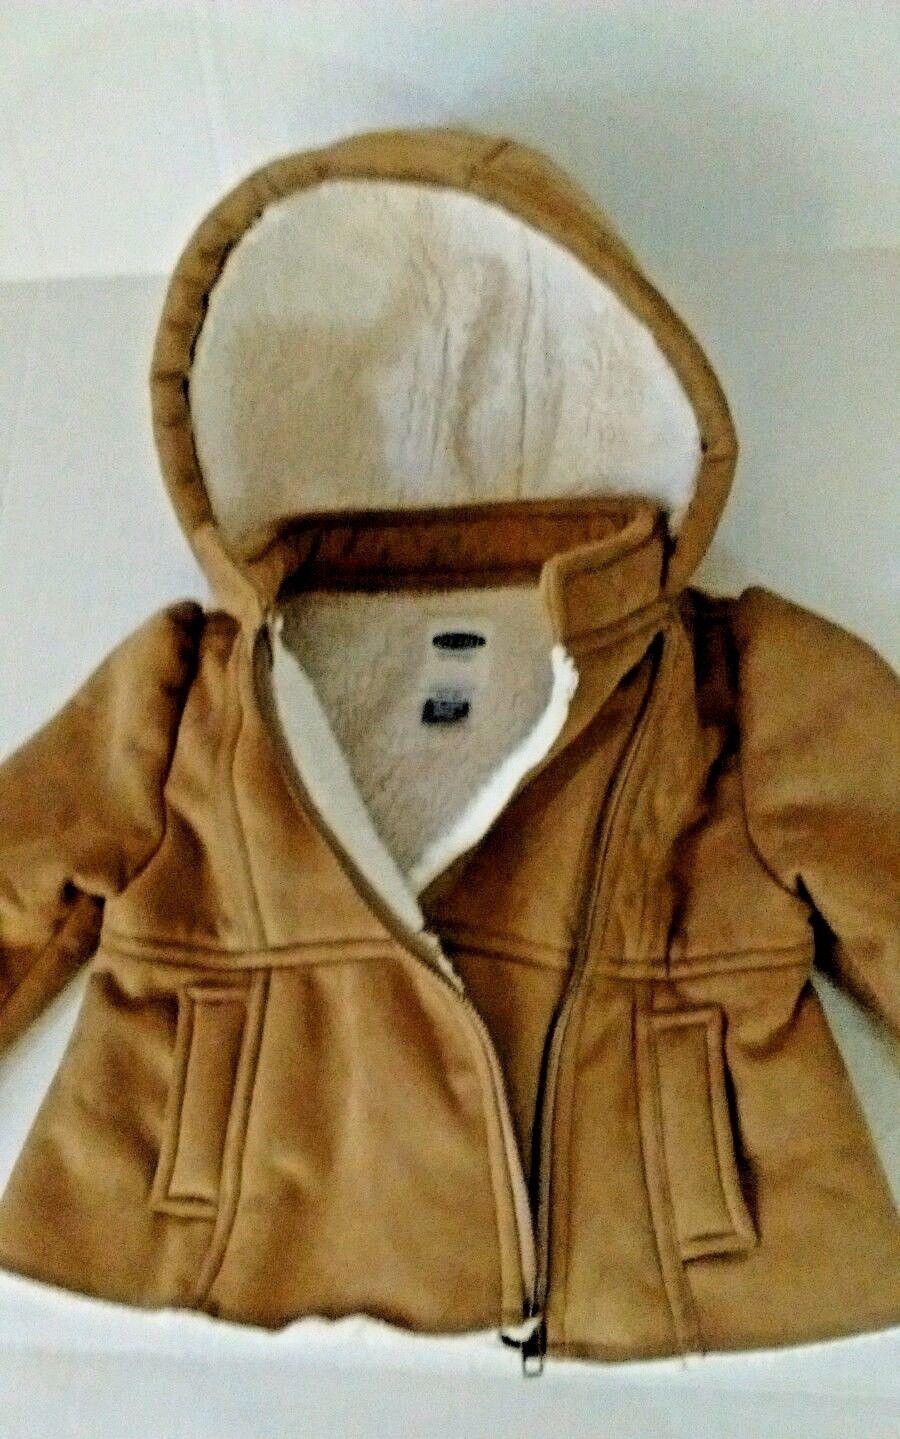 6b03219fa Old Navy Baby Boys Girls Tan Hood Fleece and similar items